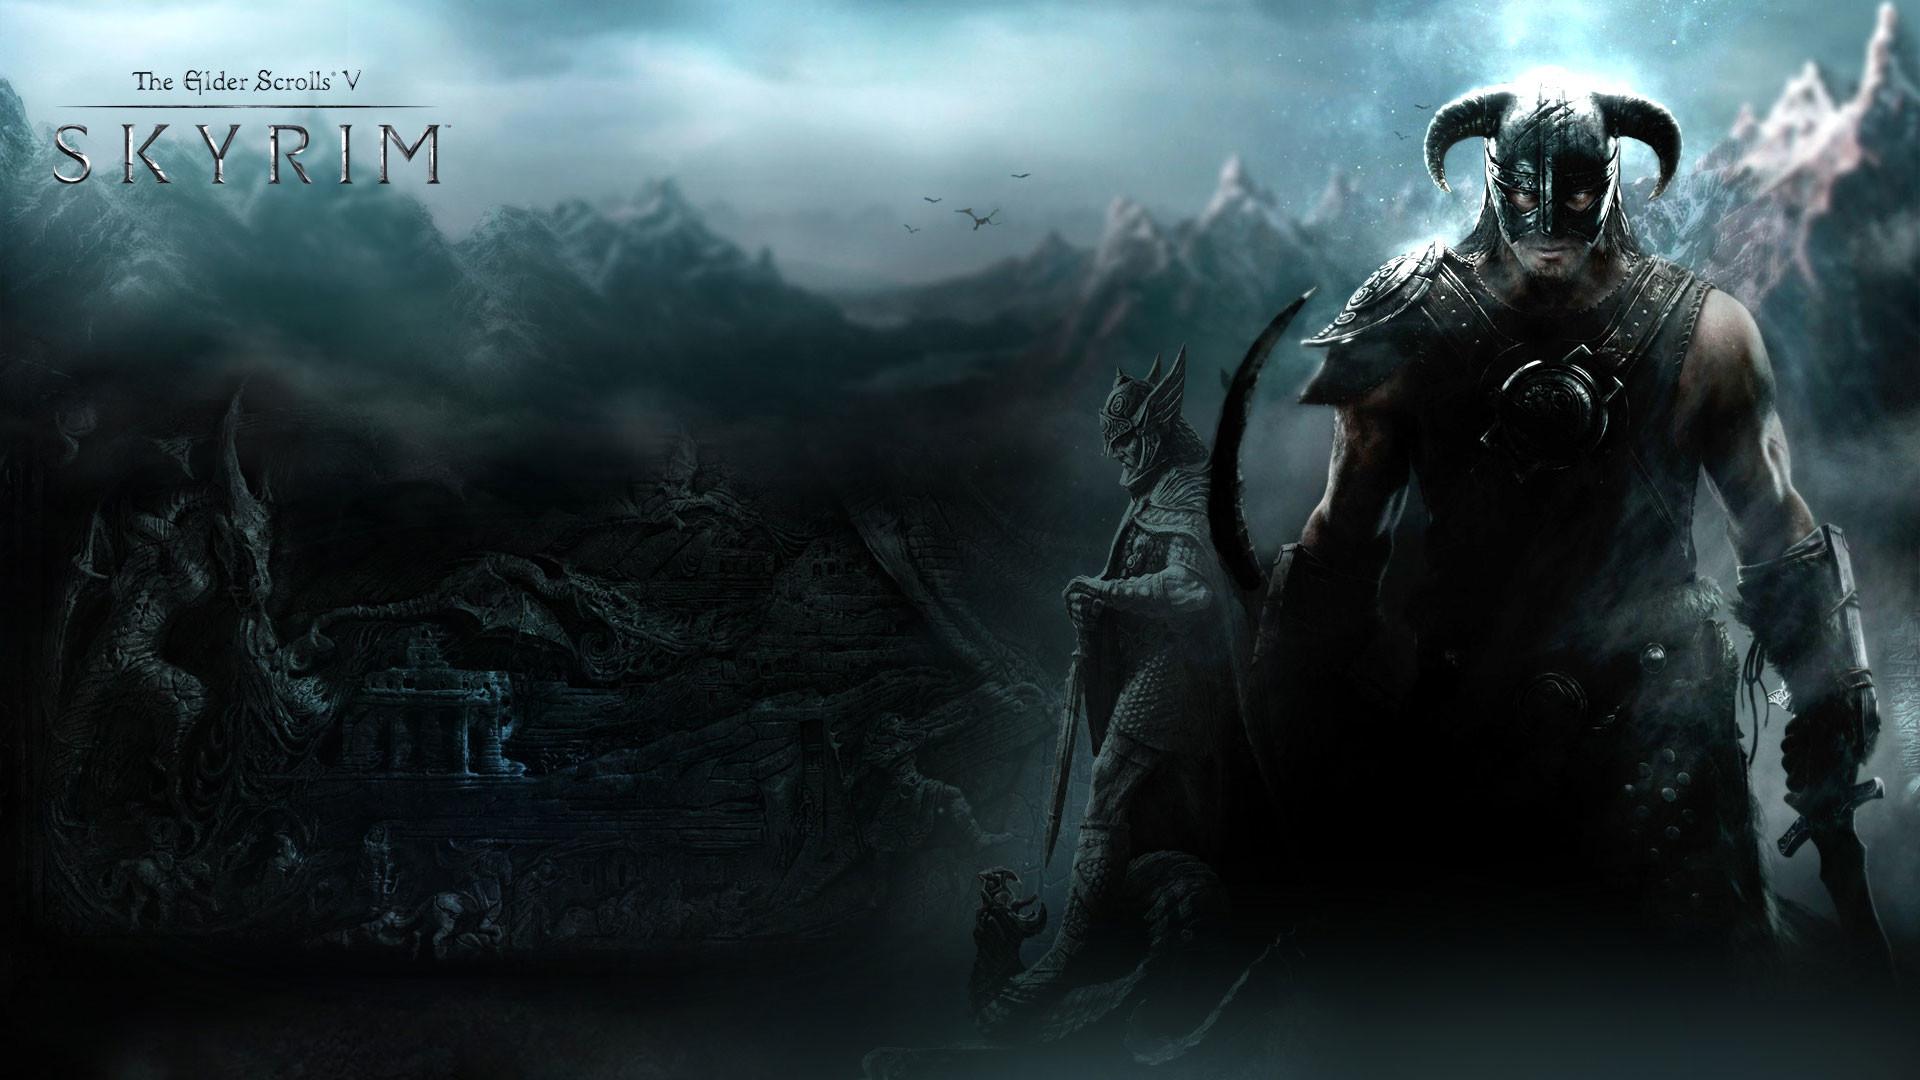 The Elder Scrolls V: Skyrim HD Wallpaper_003